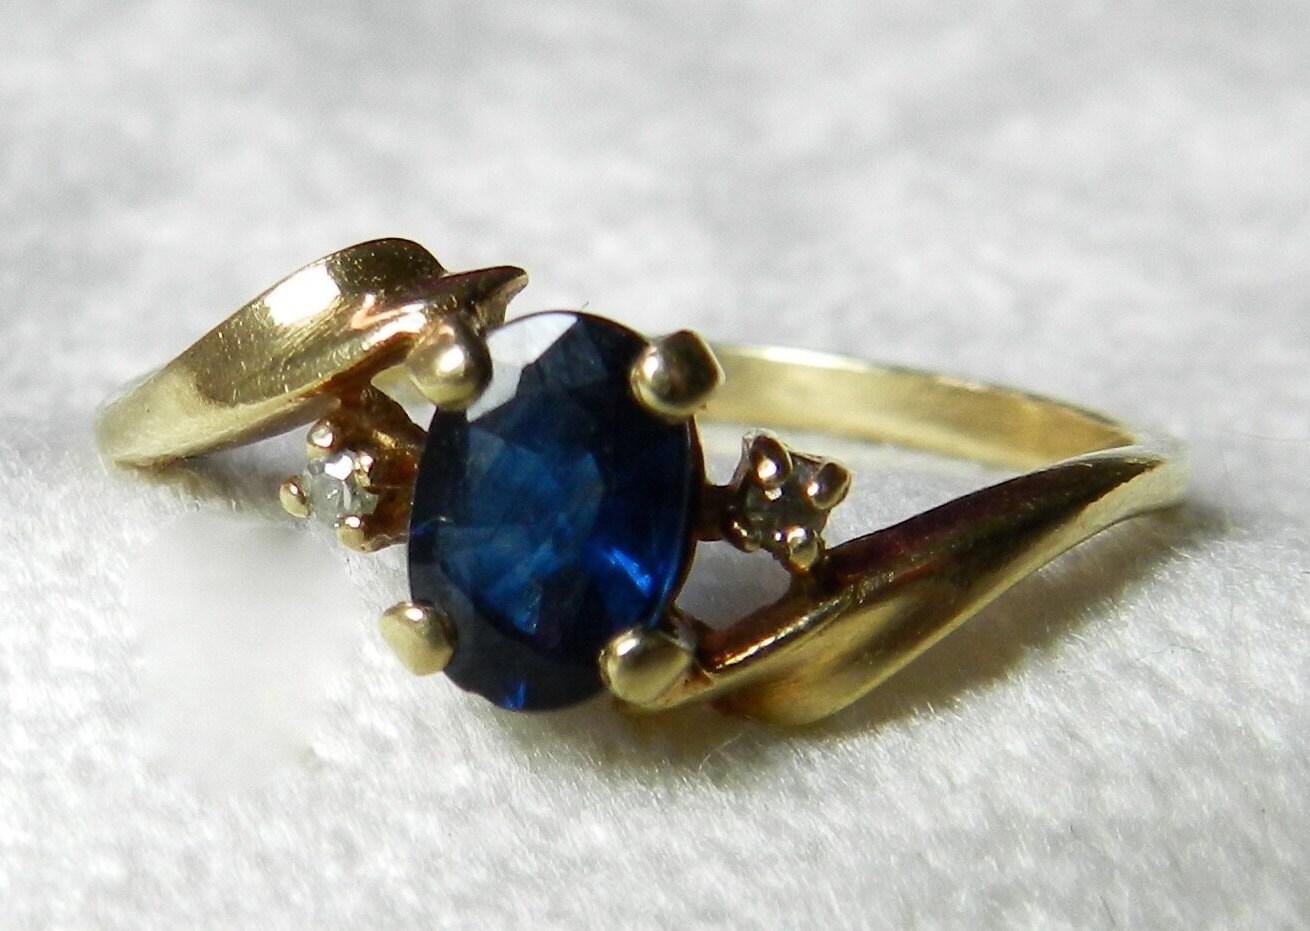 sapphire engagement ring genuine blue sapphire vintage ring. Black Bedroom Furniture Sets. Home Design Ideas